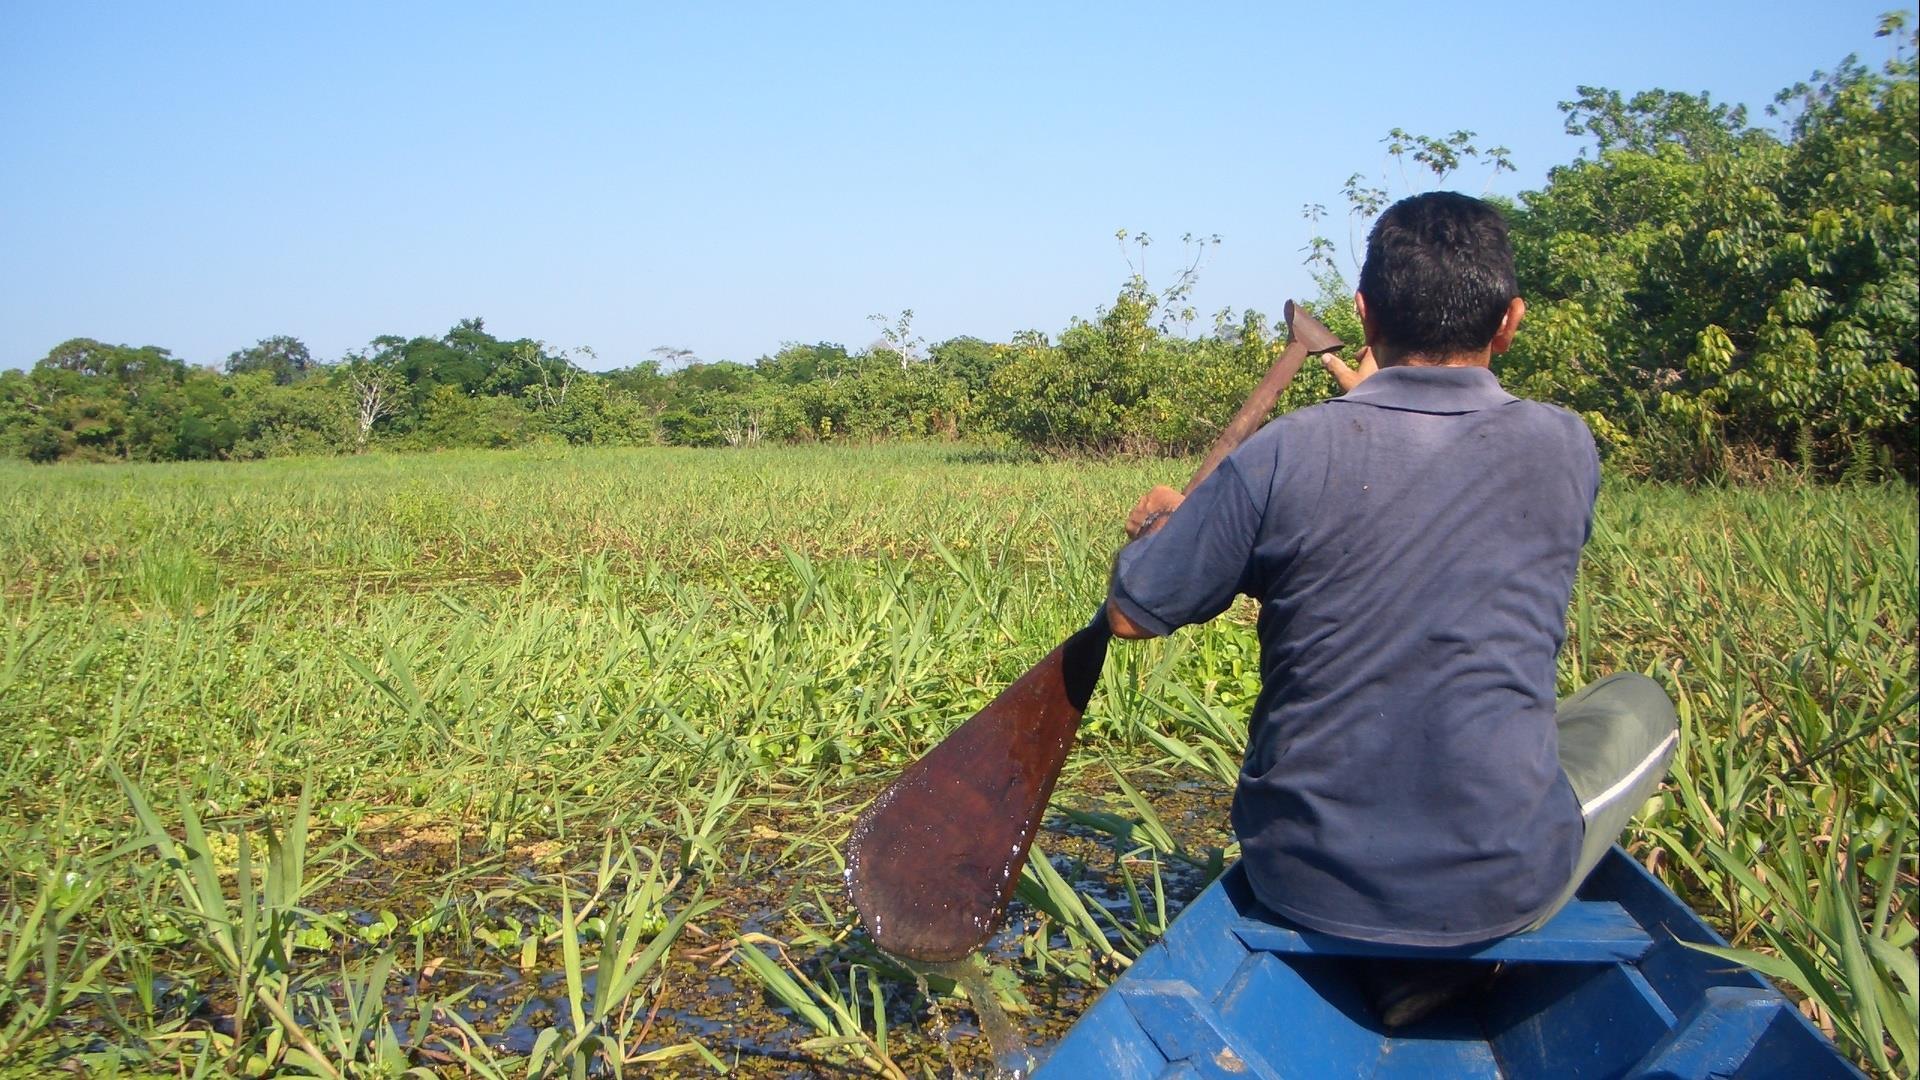 Brasilien Amazonas: 4 Tage Reisebaustein - Turtle Lodge Kayak Expedition: Guide im Kayak